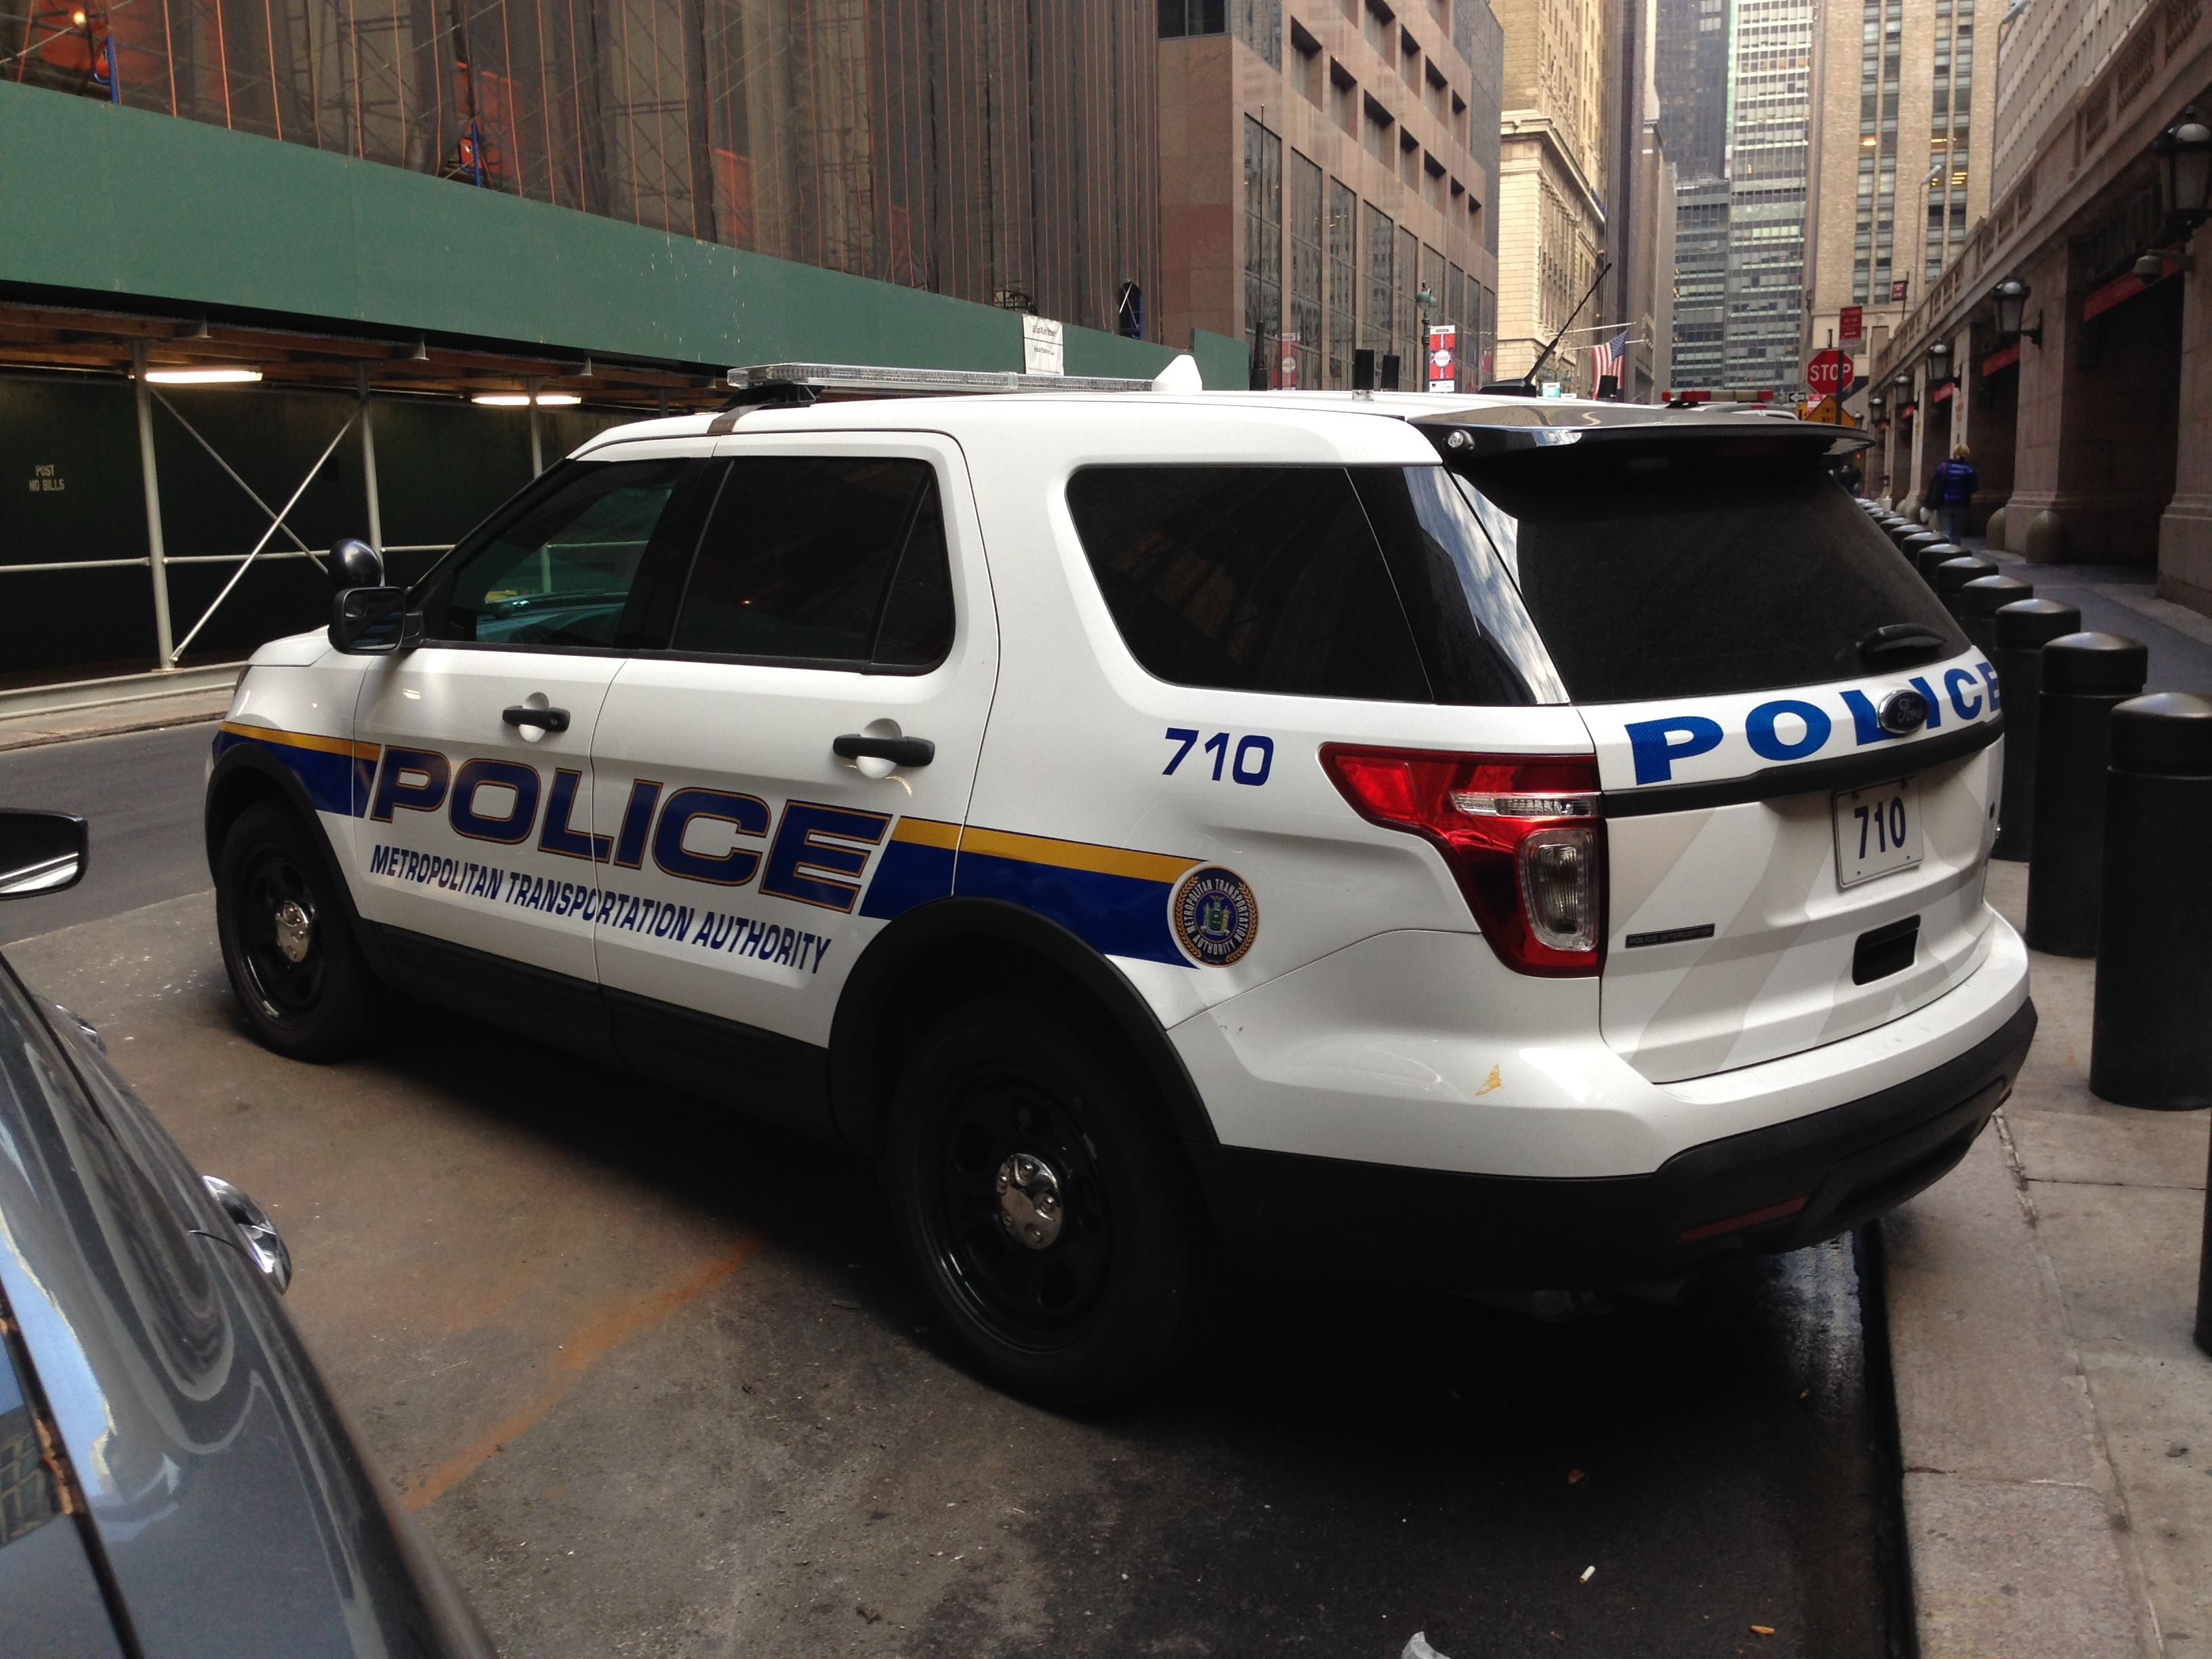 Mta Police Department Ford Interceptor Suv Nyc Police Cars Old Police Cars Police